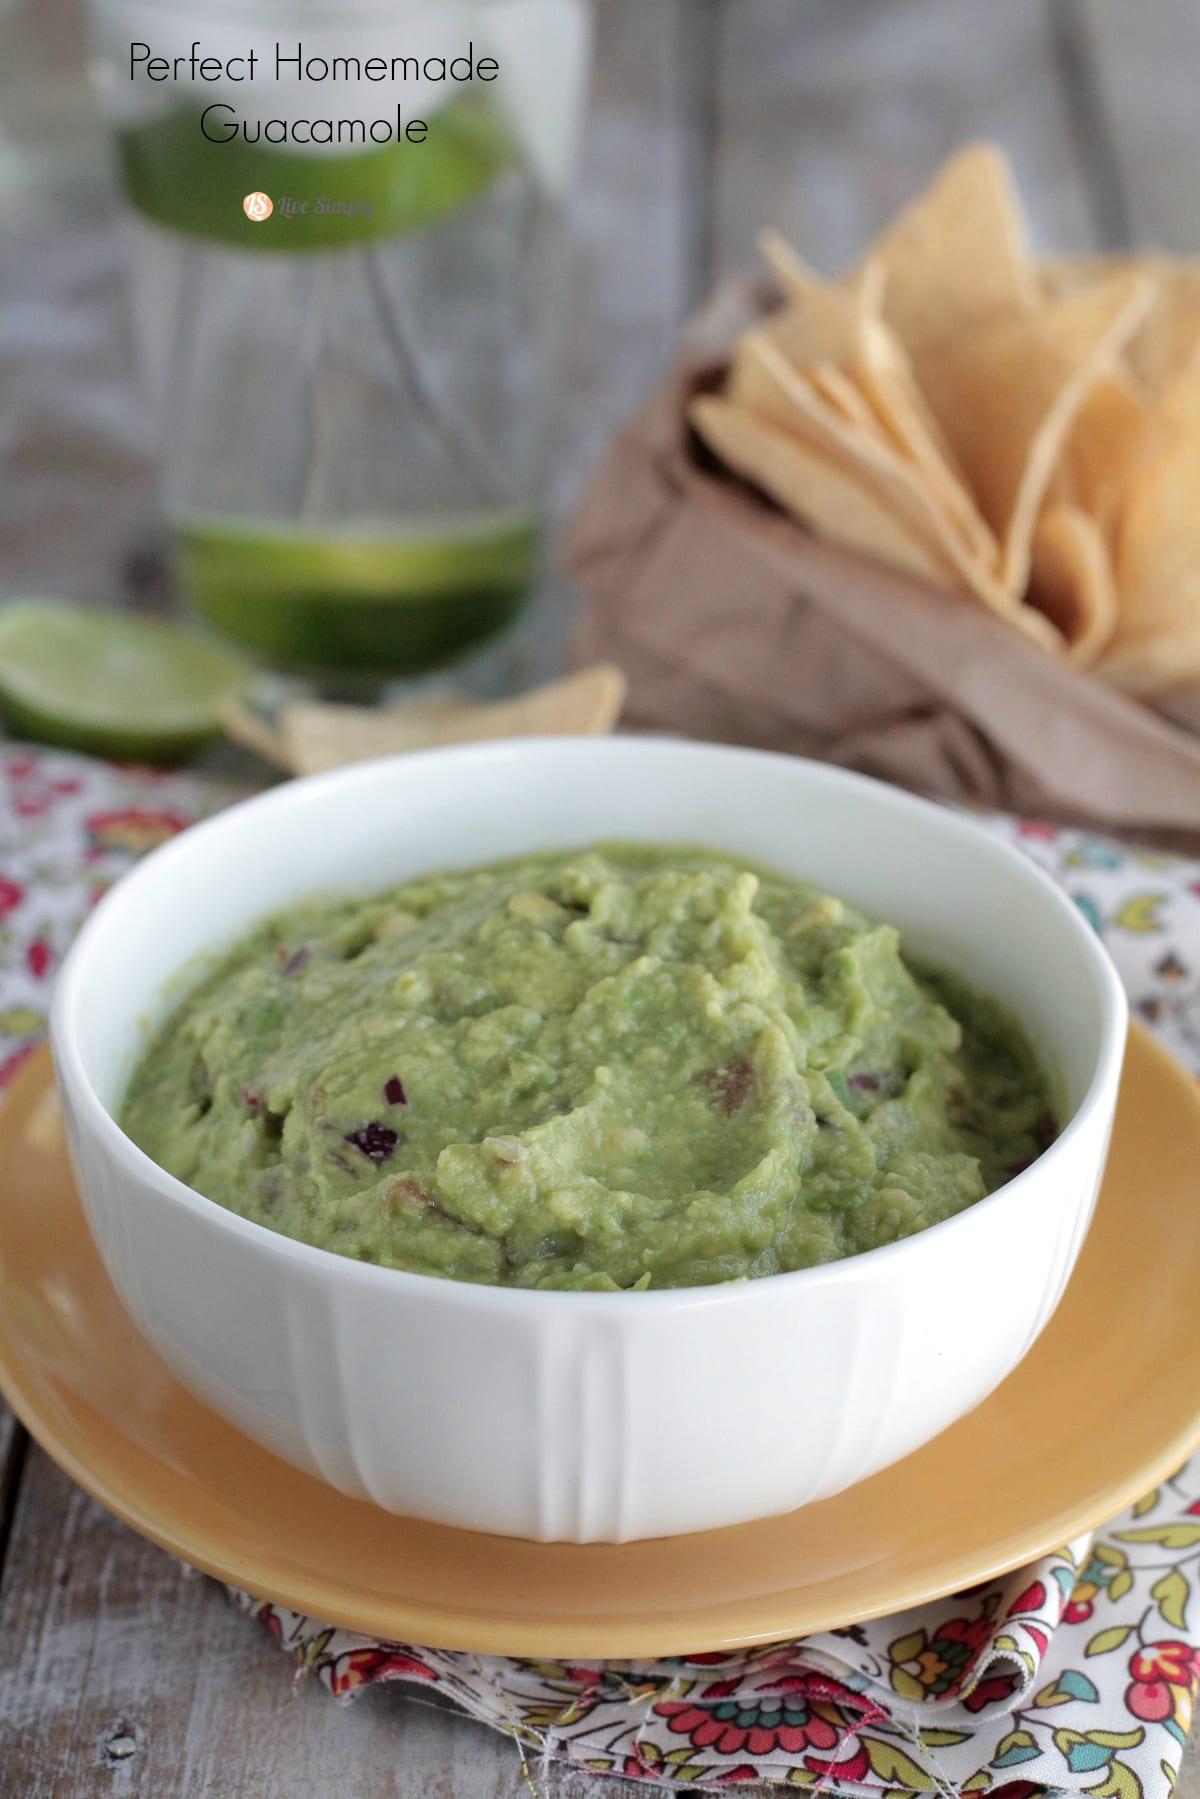 guacamole guacamole guacamole guacamole fried guacamole perfect